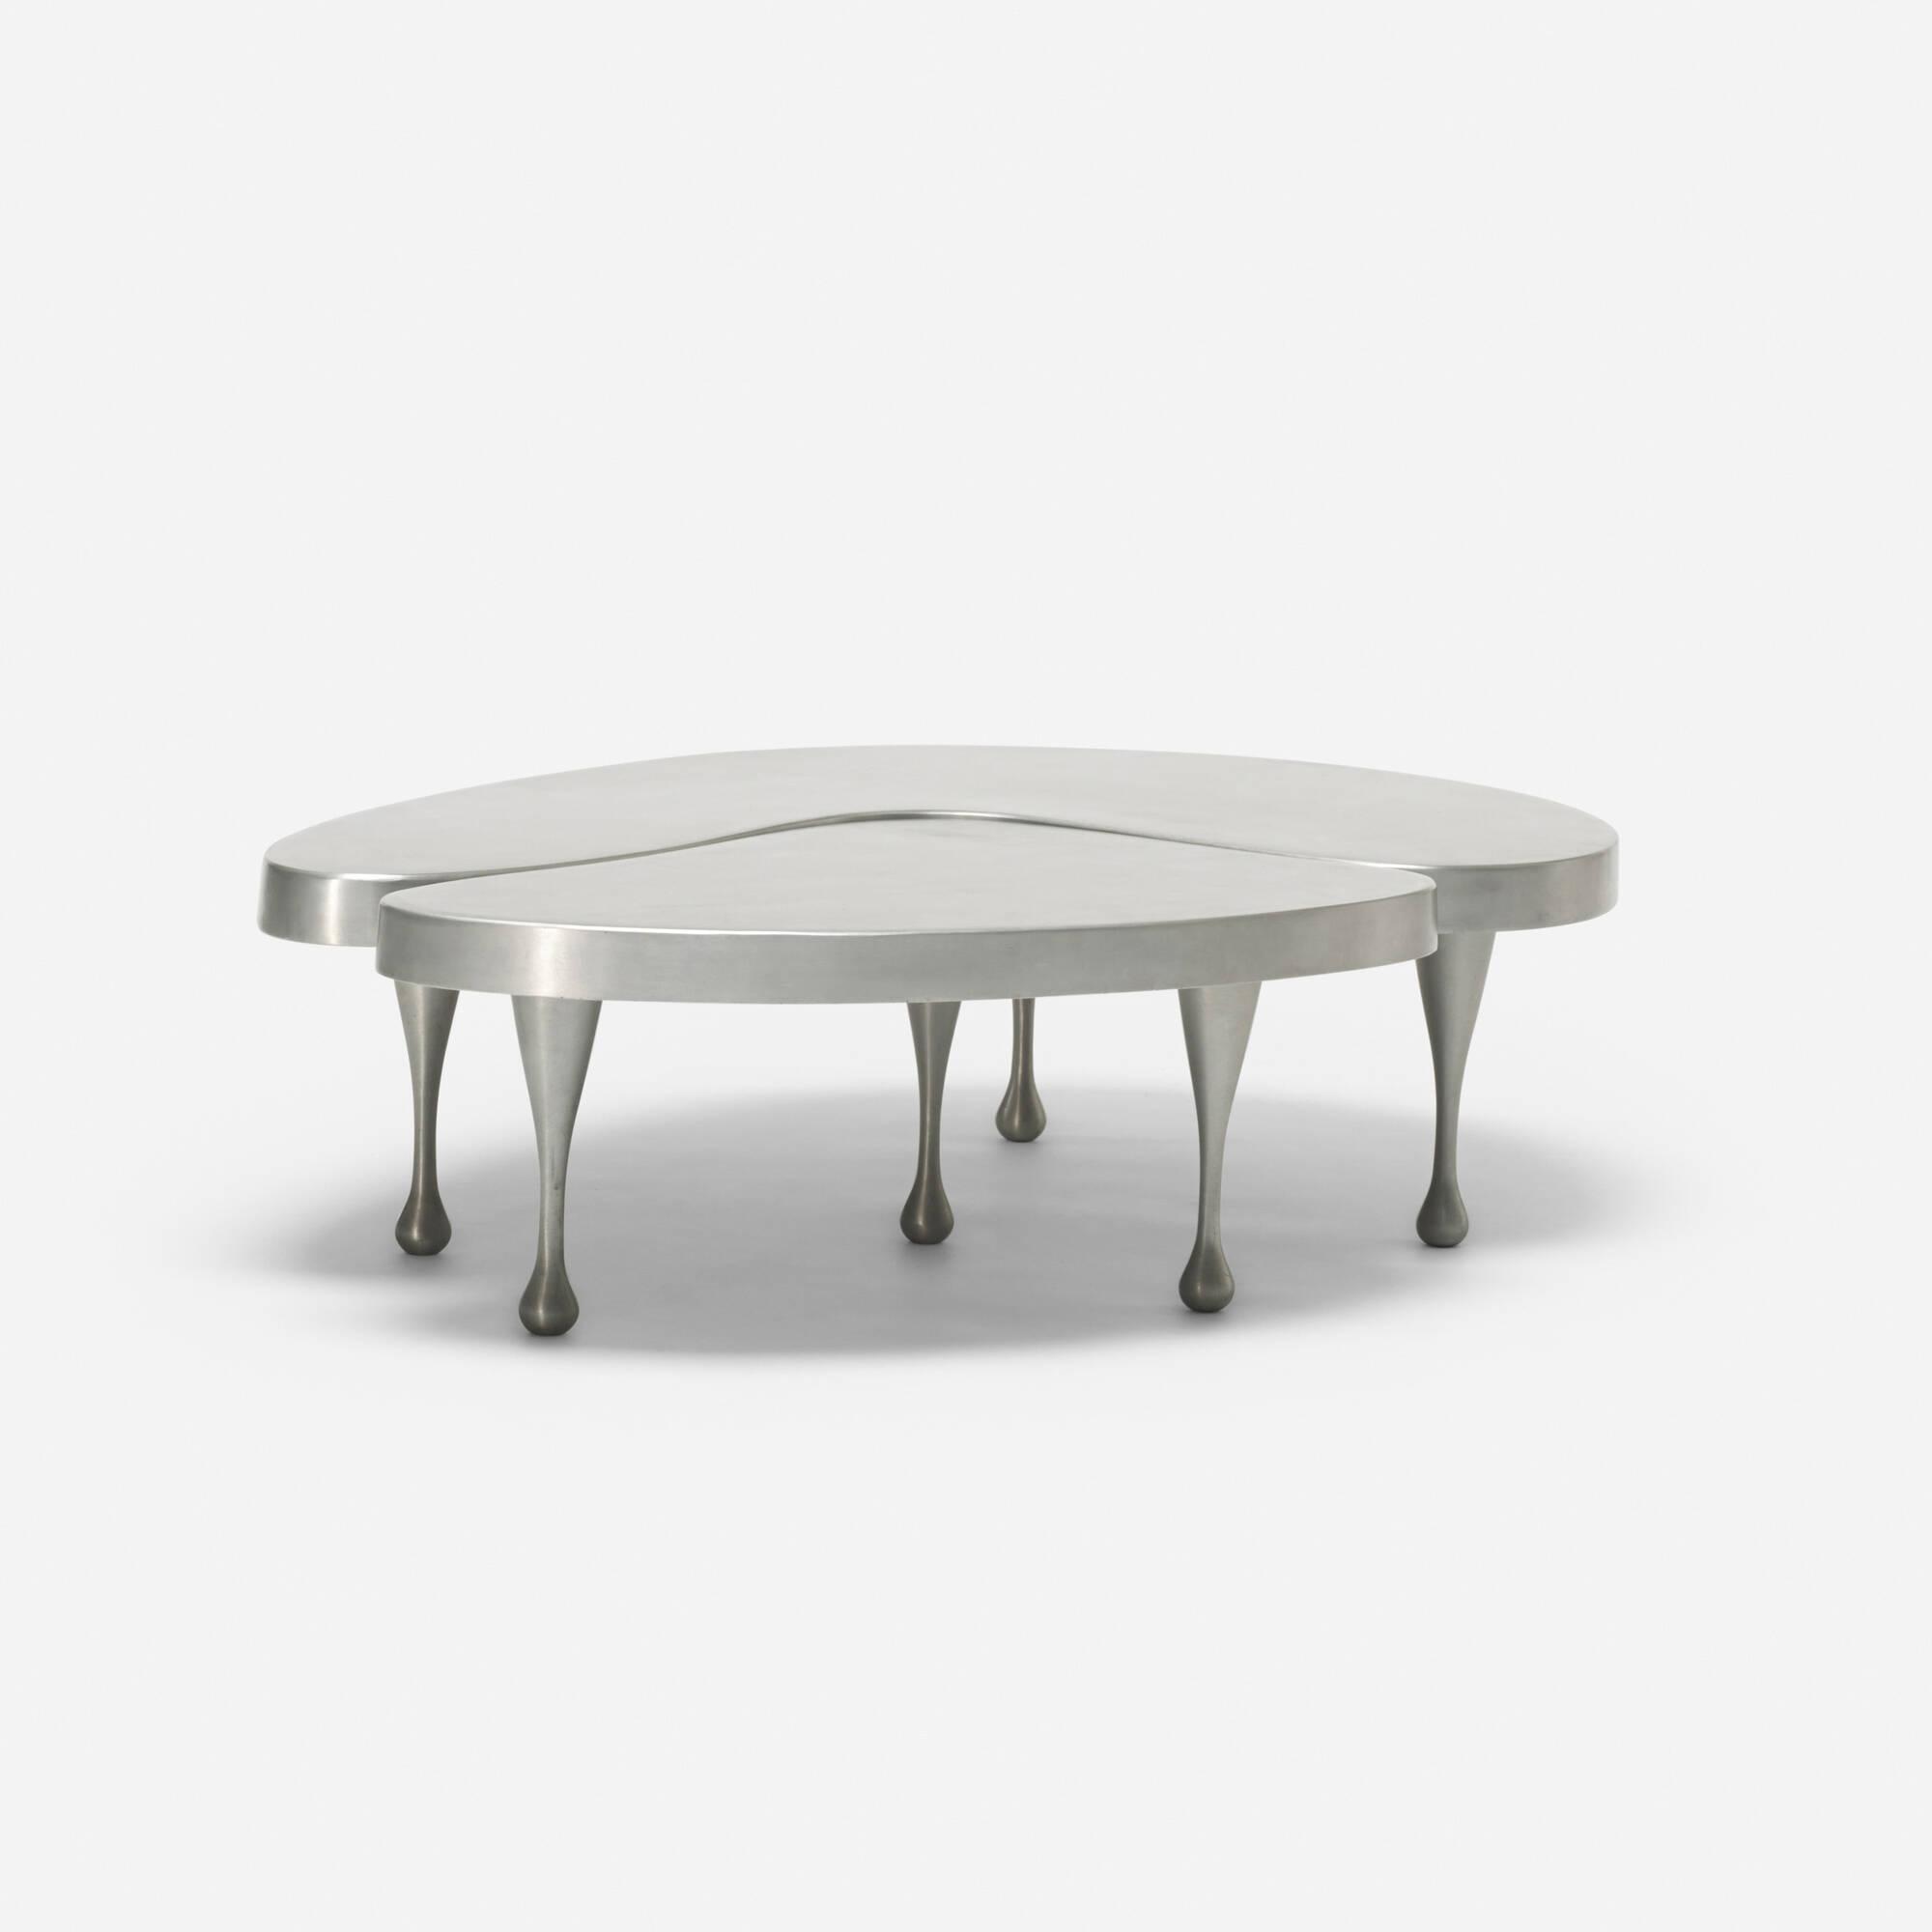 310: Frederick Kiesler / tables (2 of 7)